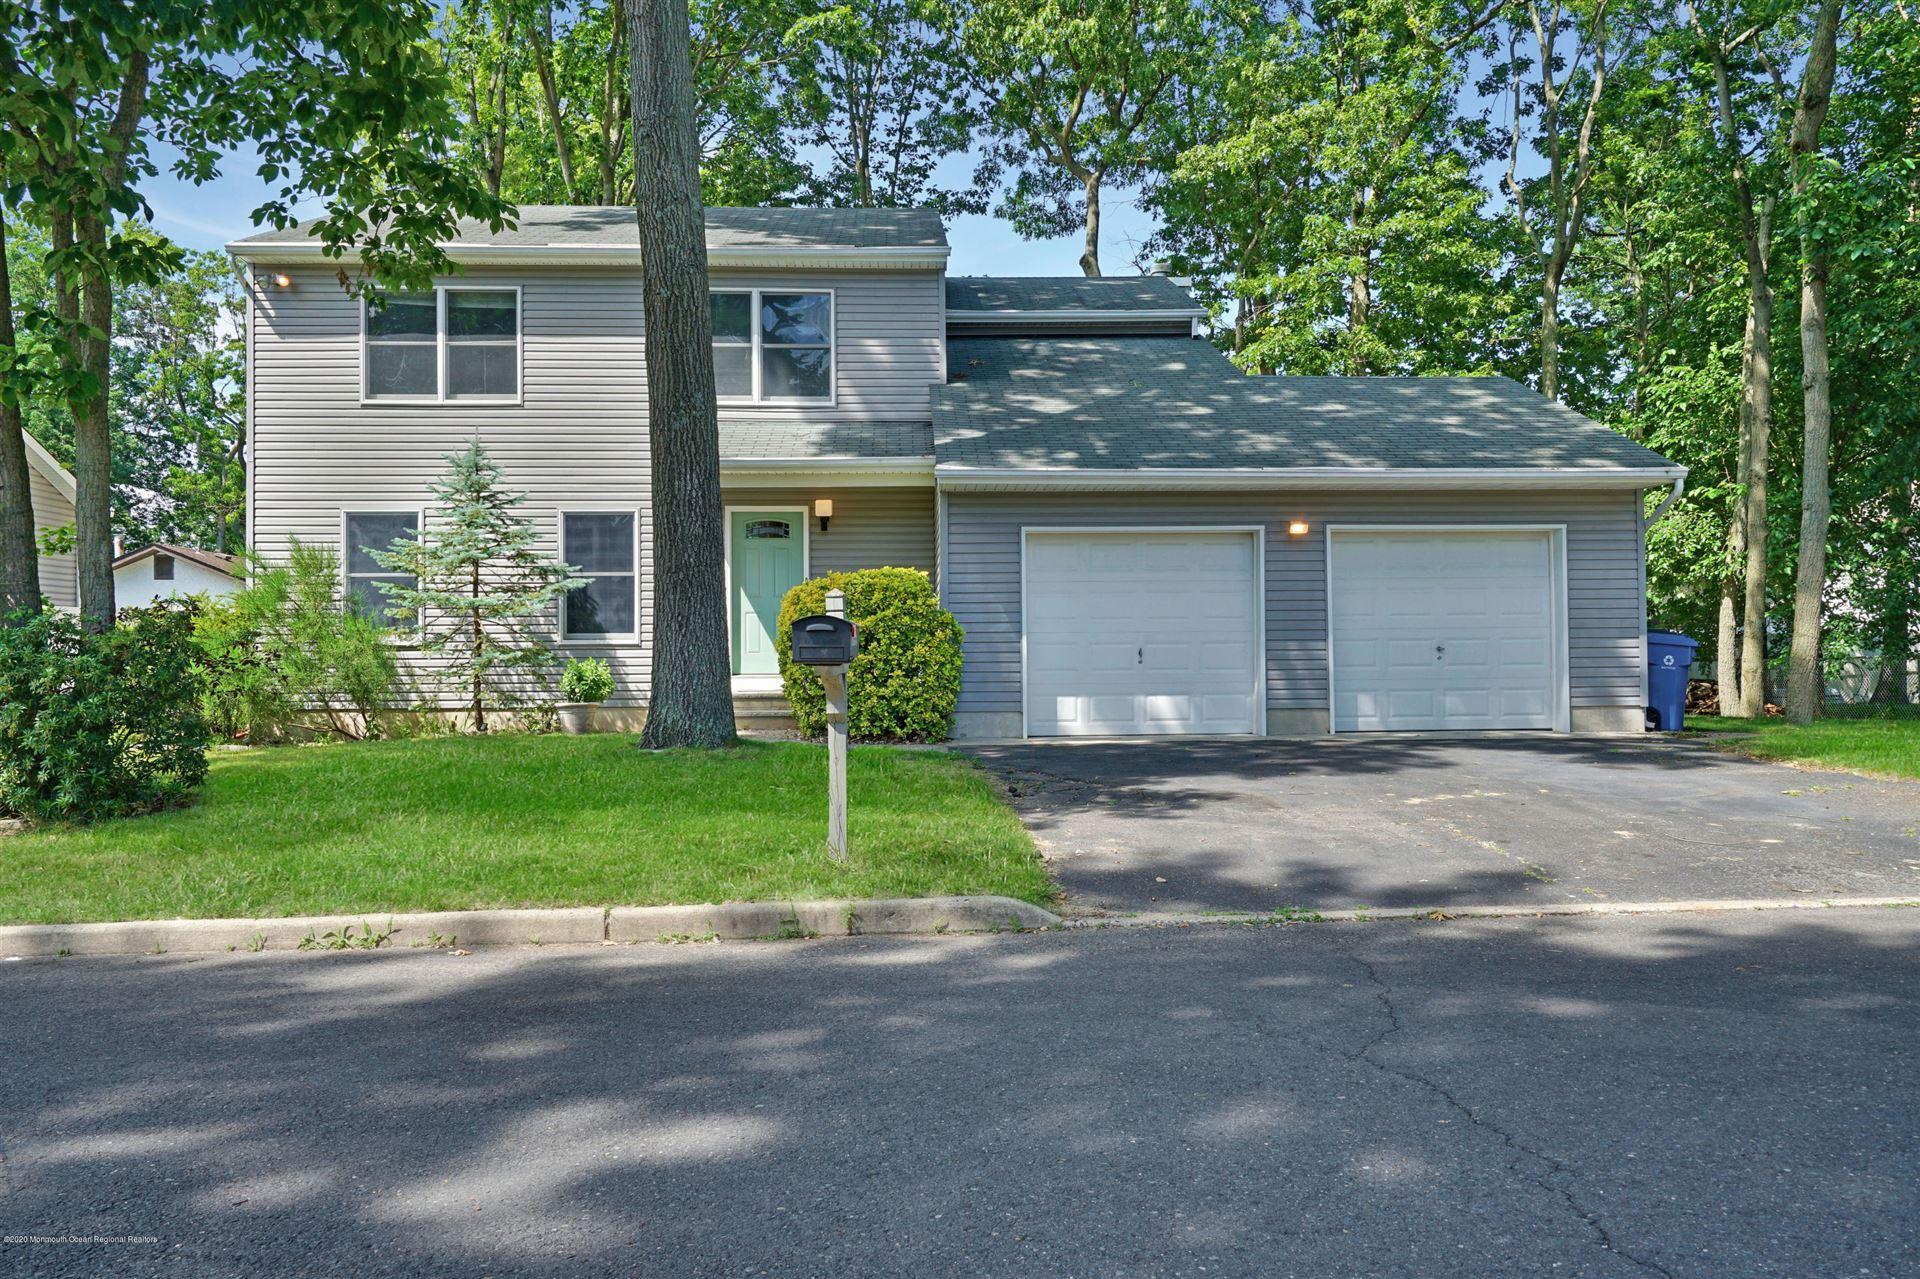 178 Foxcroft Street, Brick, NJ 08724 - #: 22021343